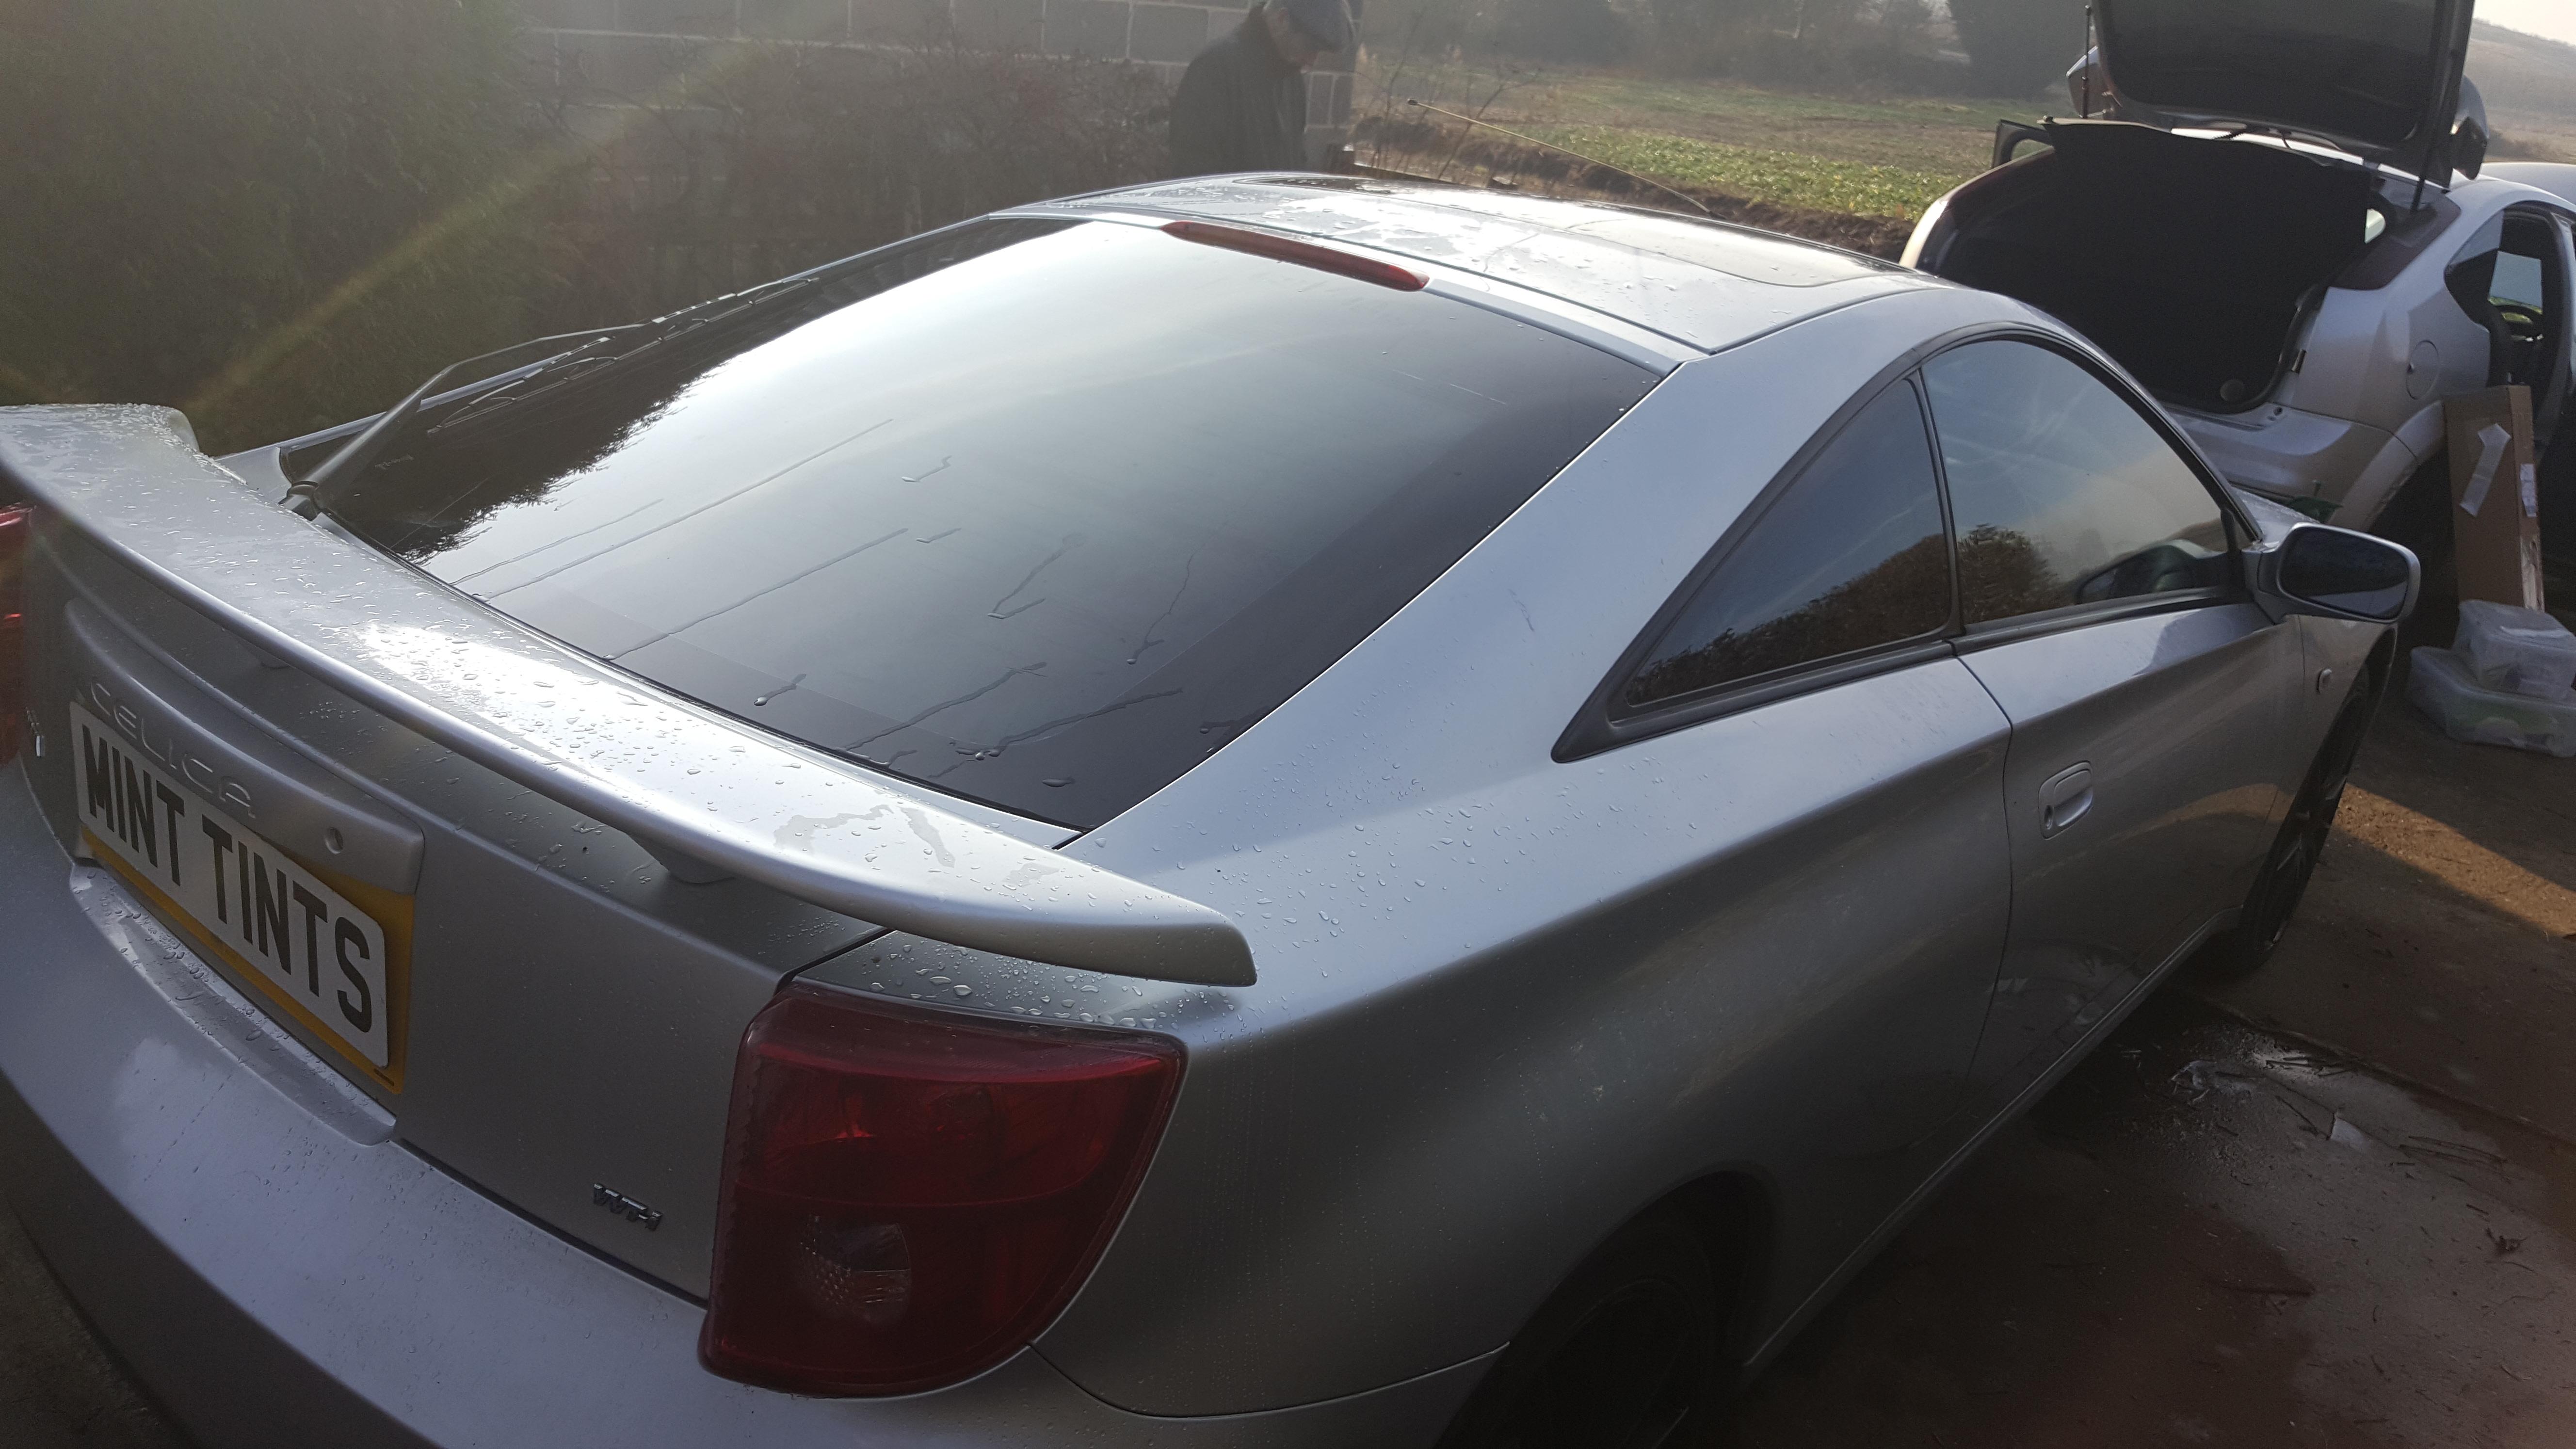 Toyota Celica - 5% Limo Black Tint